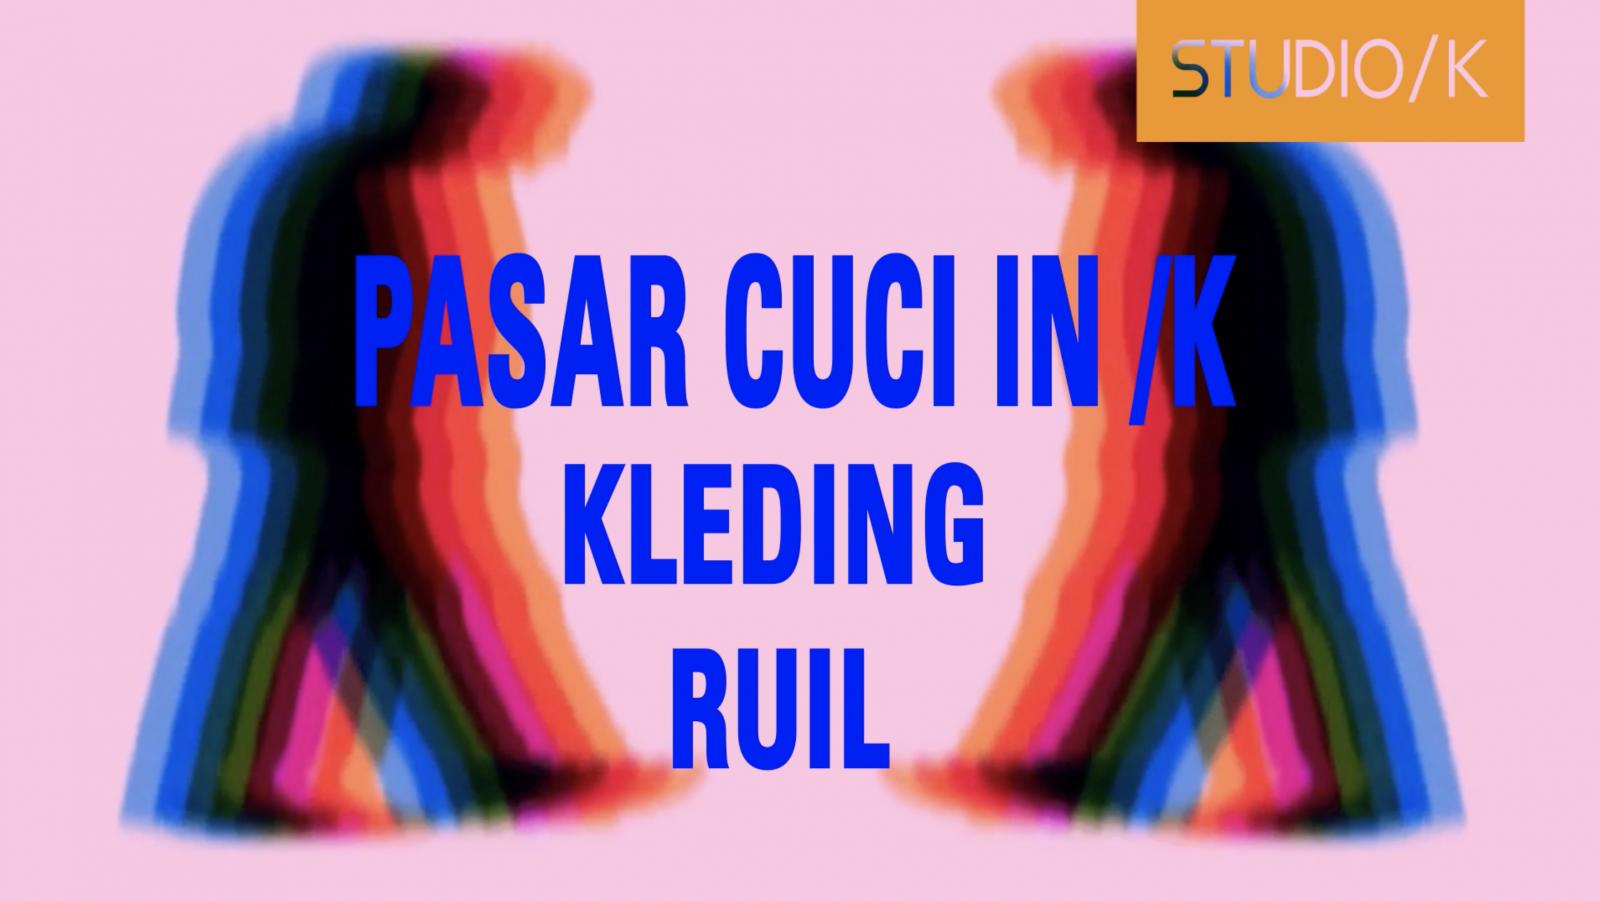 Kledingruilbeurs Pasar Cuci in /K